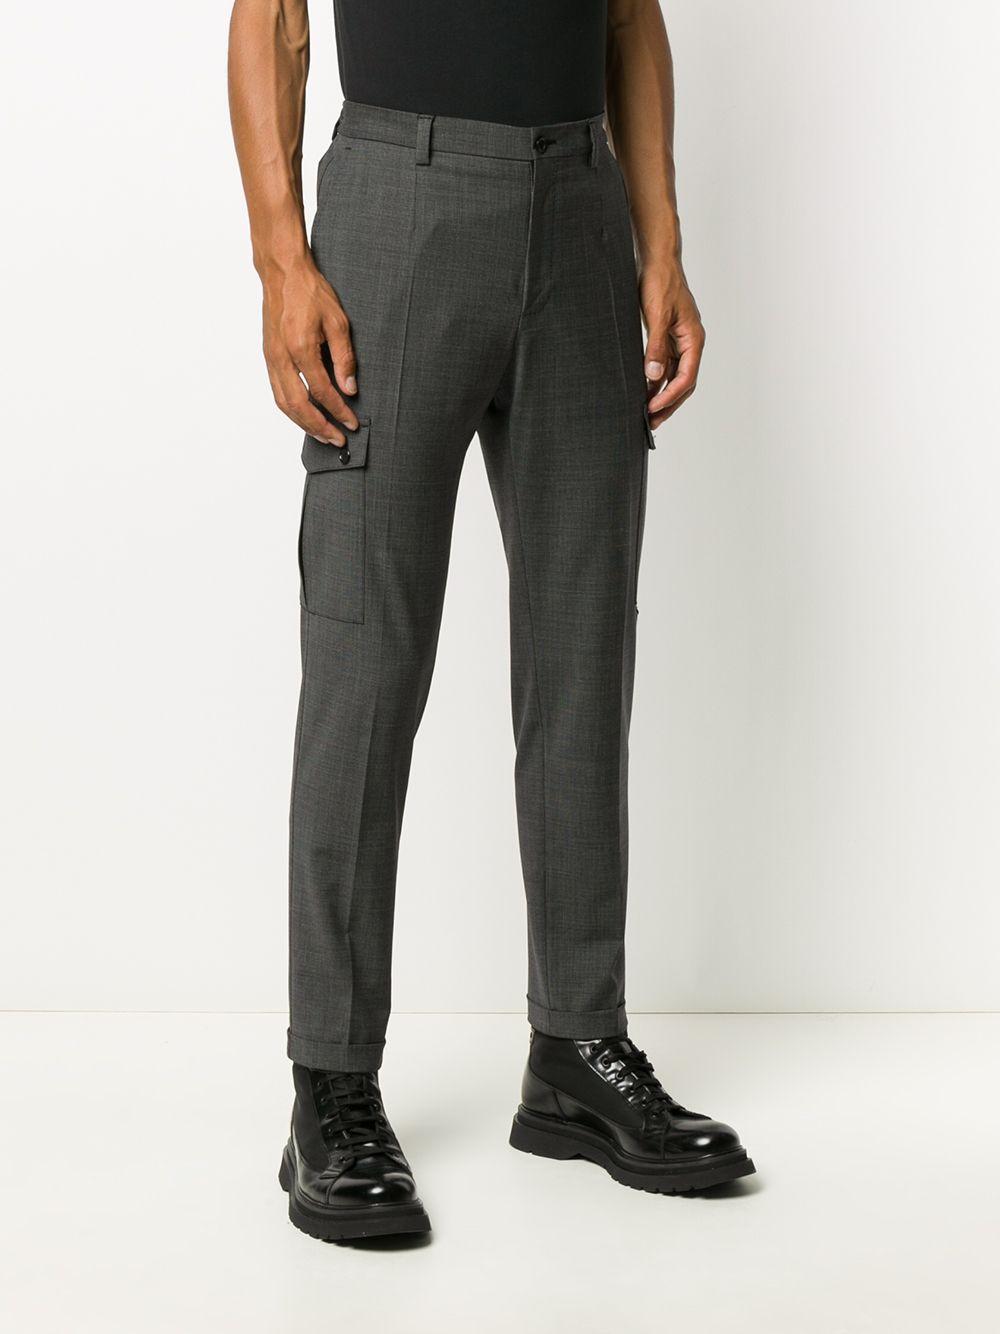 pantalone cargo grigio in misto lana DOLCE & GABBANA   Pantaloni   GWQ1ET-FMRA4S8030